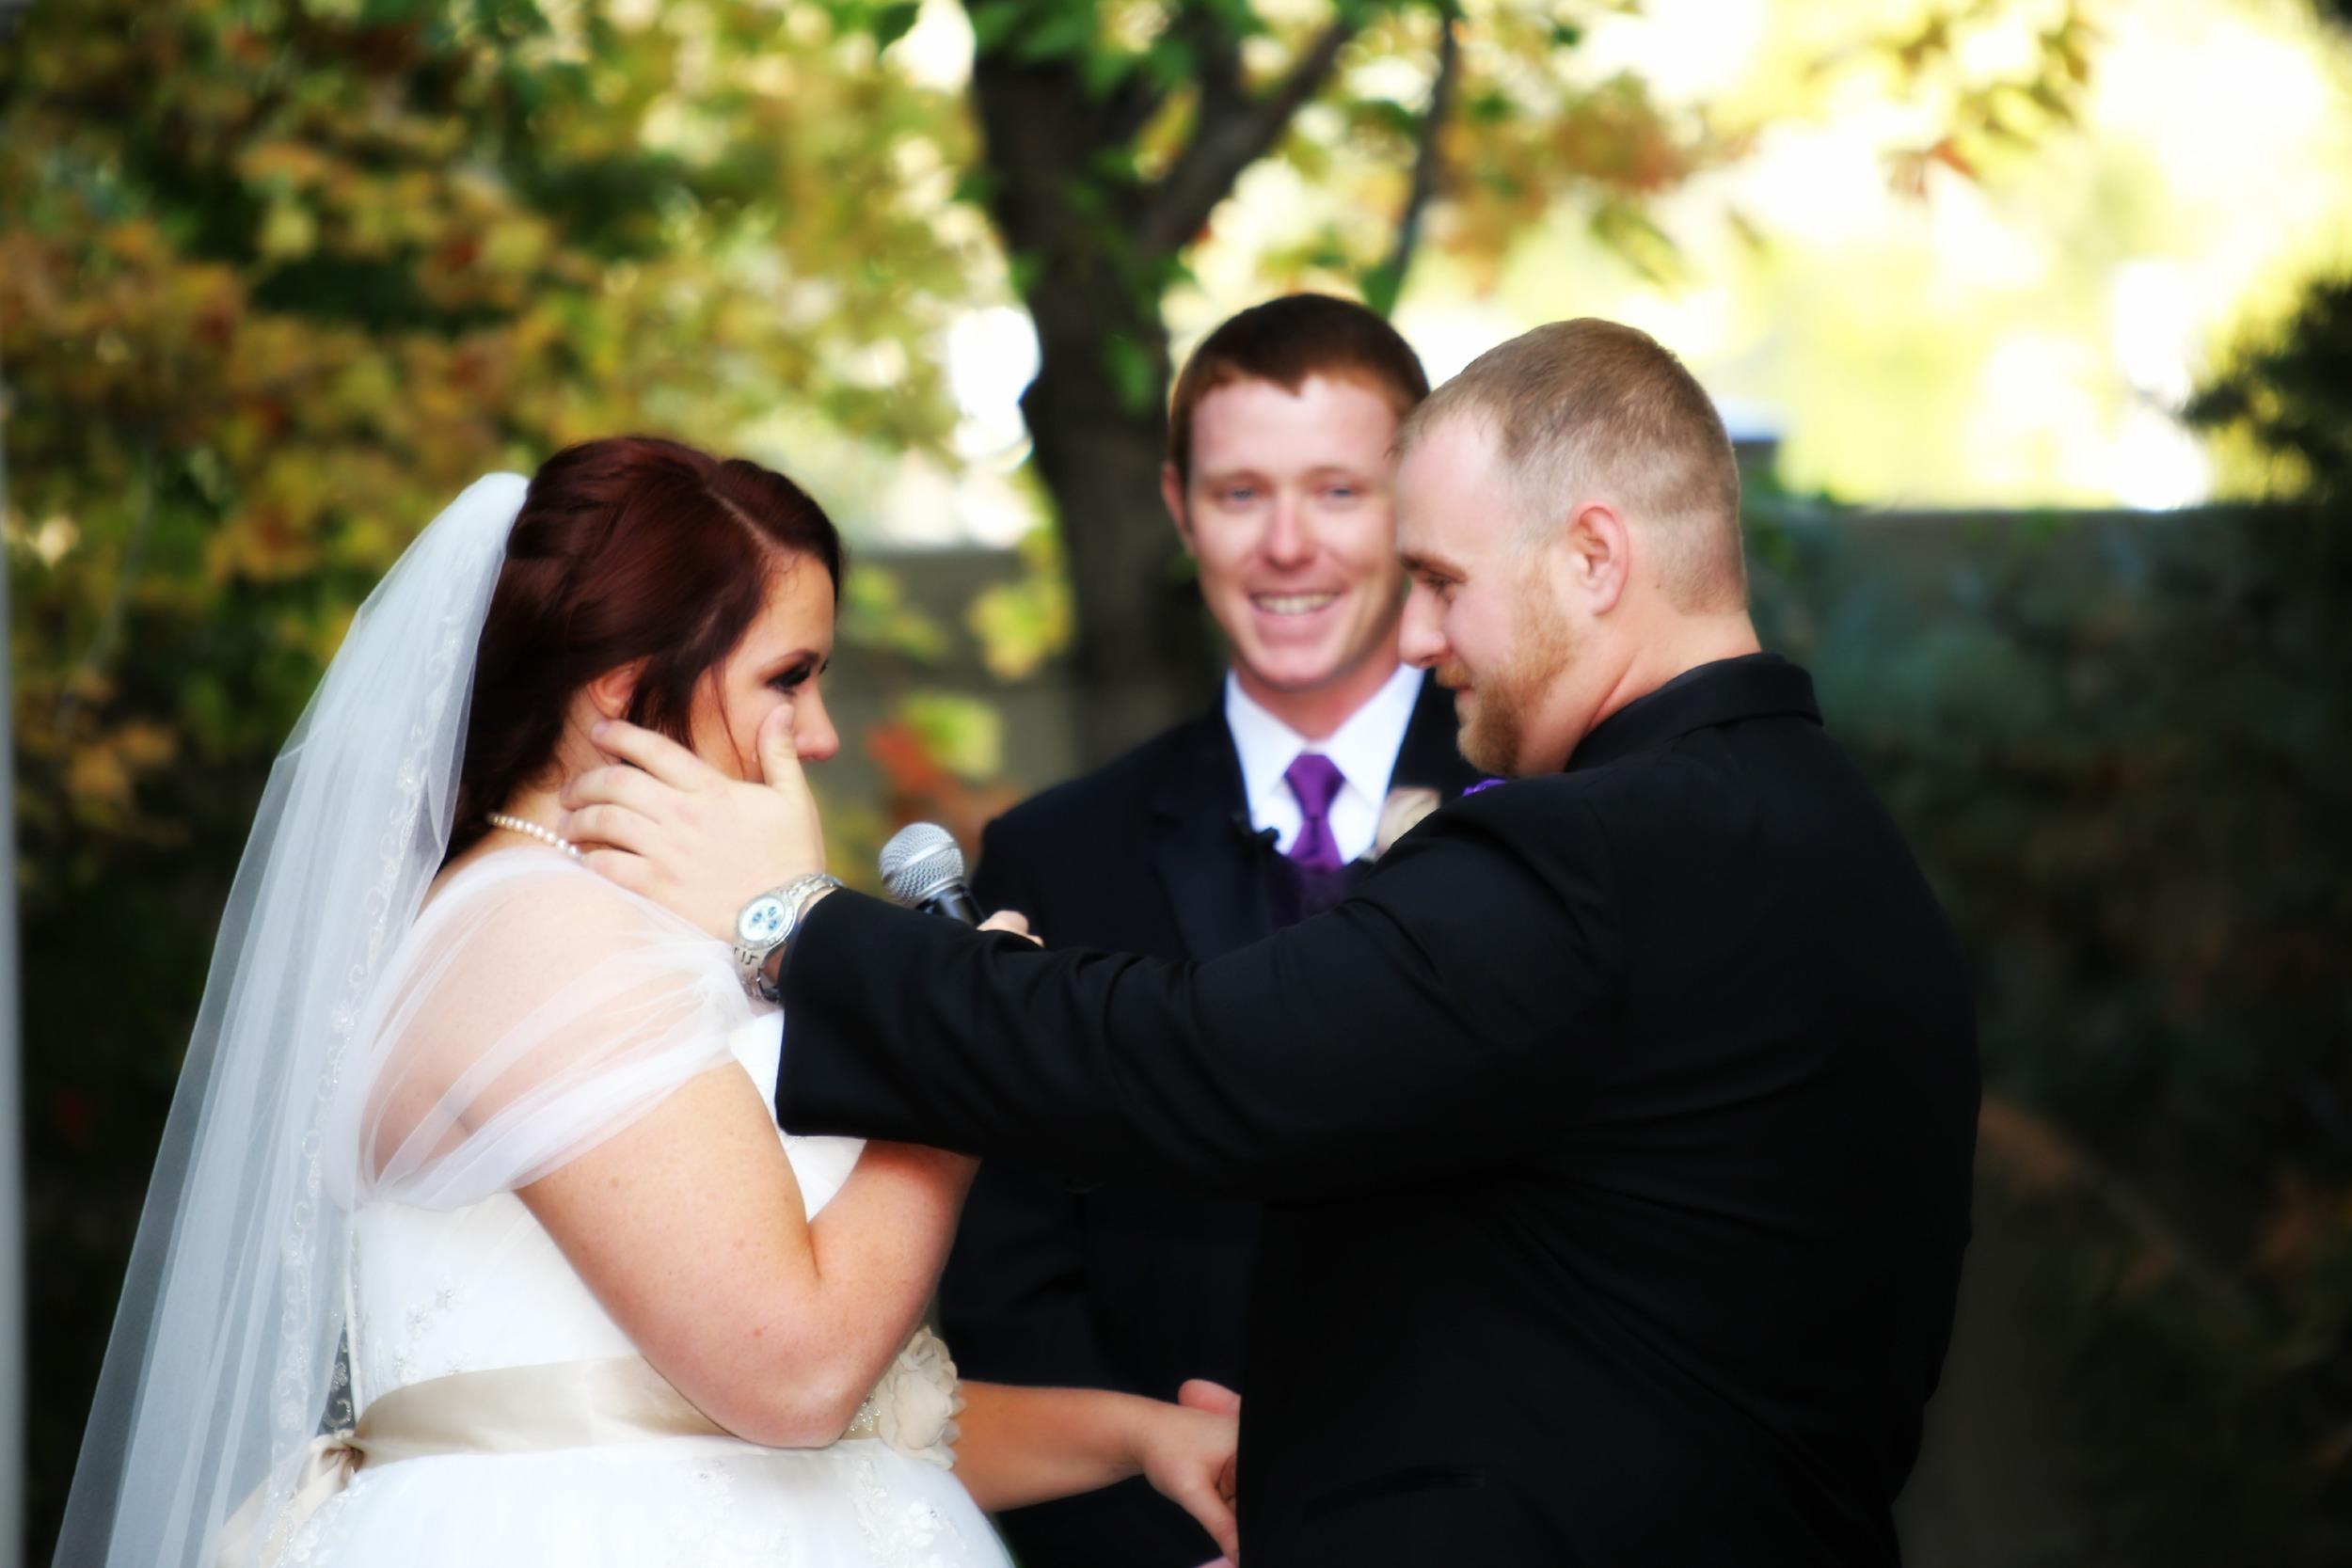 Bountiful outdoor wedding ceremony photography